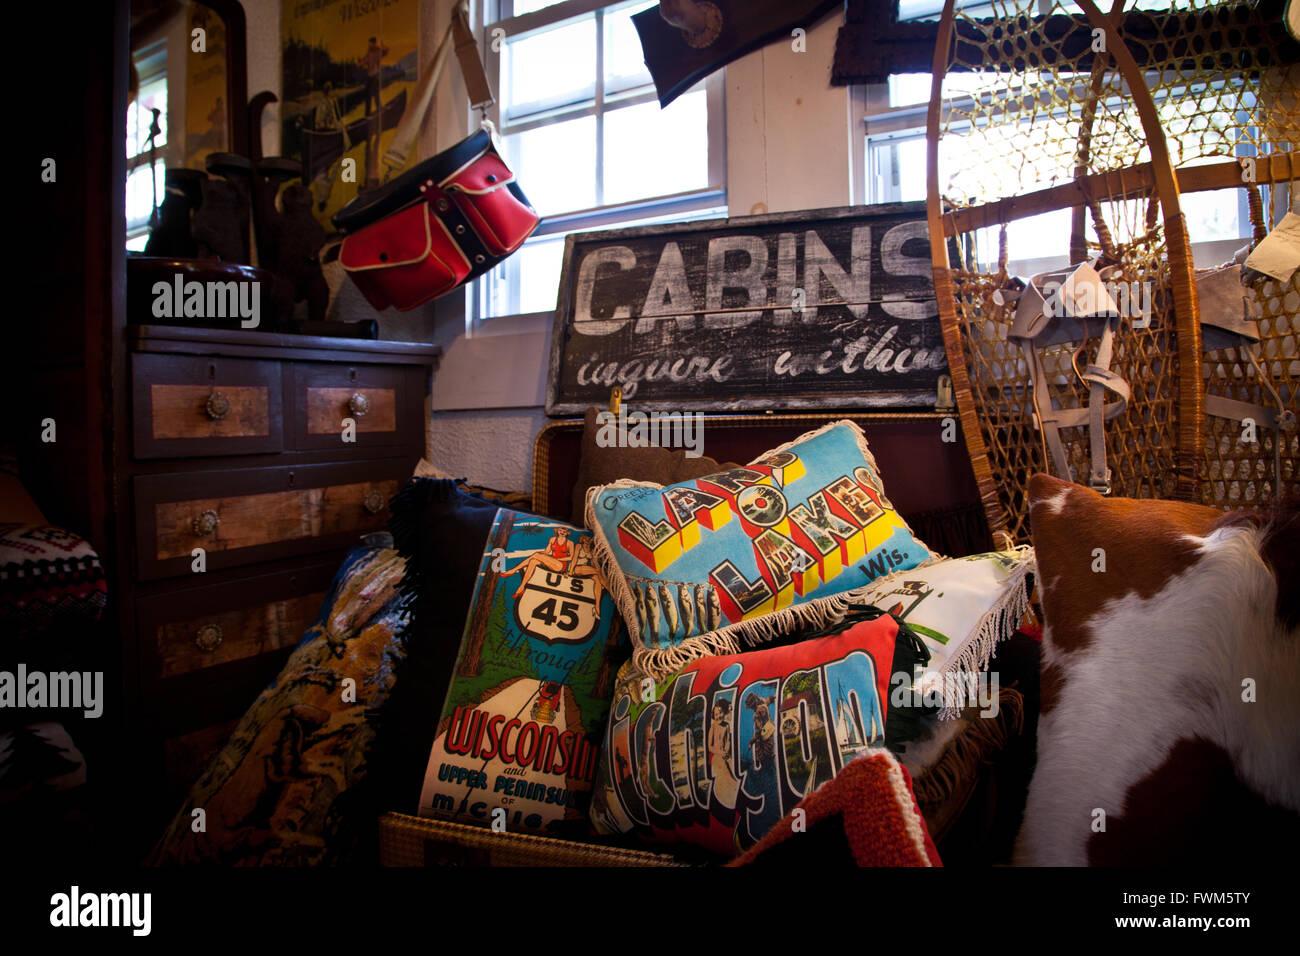 Dorfladen in Northwoods im Land O' Lakes, Wisconsin Stockfoto